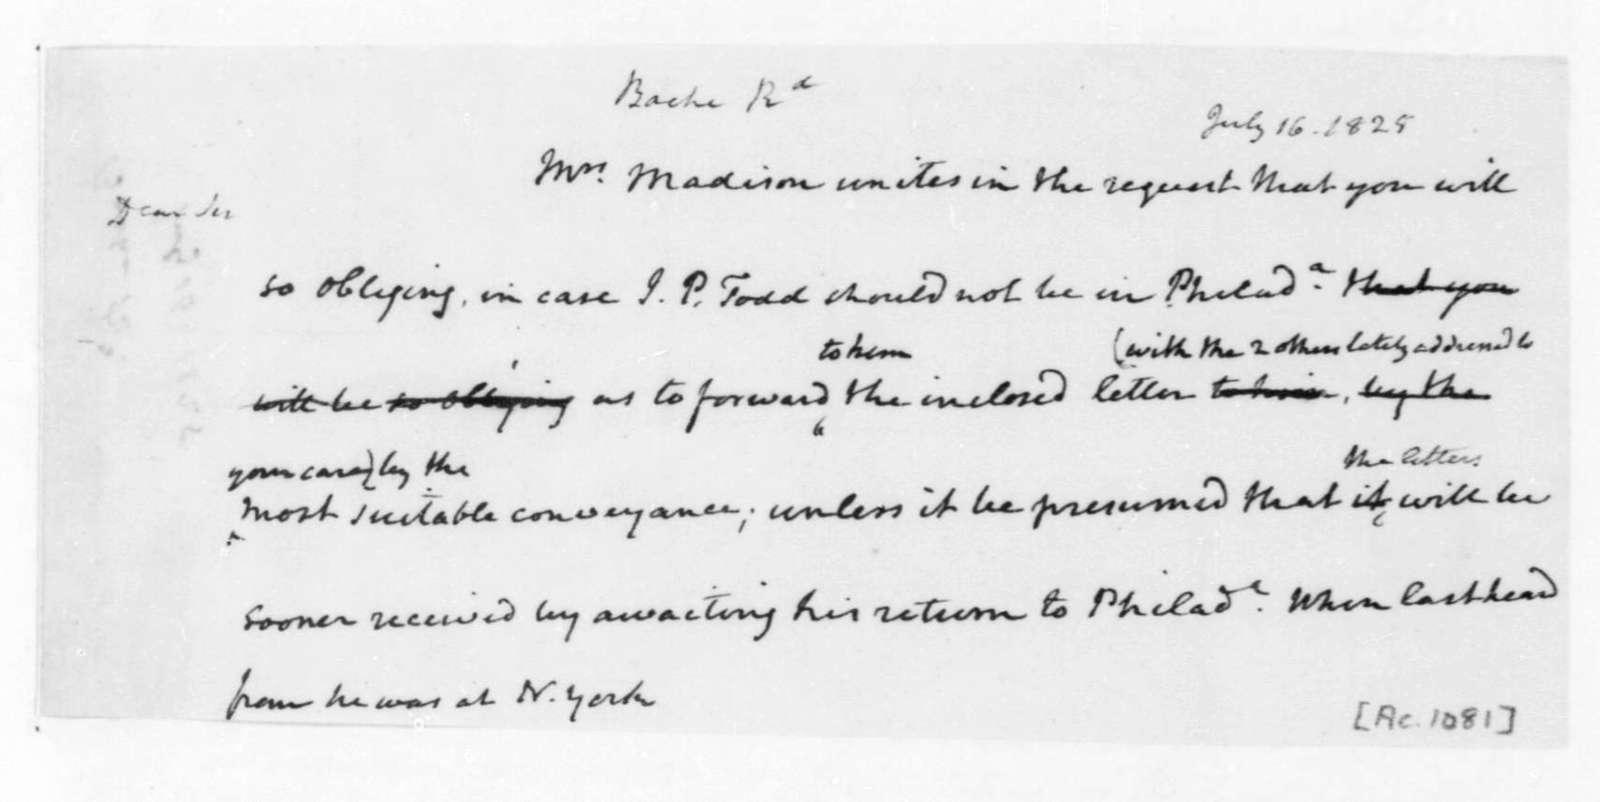 James Madison to Richard Bache, July 16, 1825.